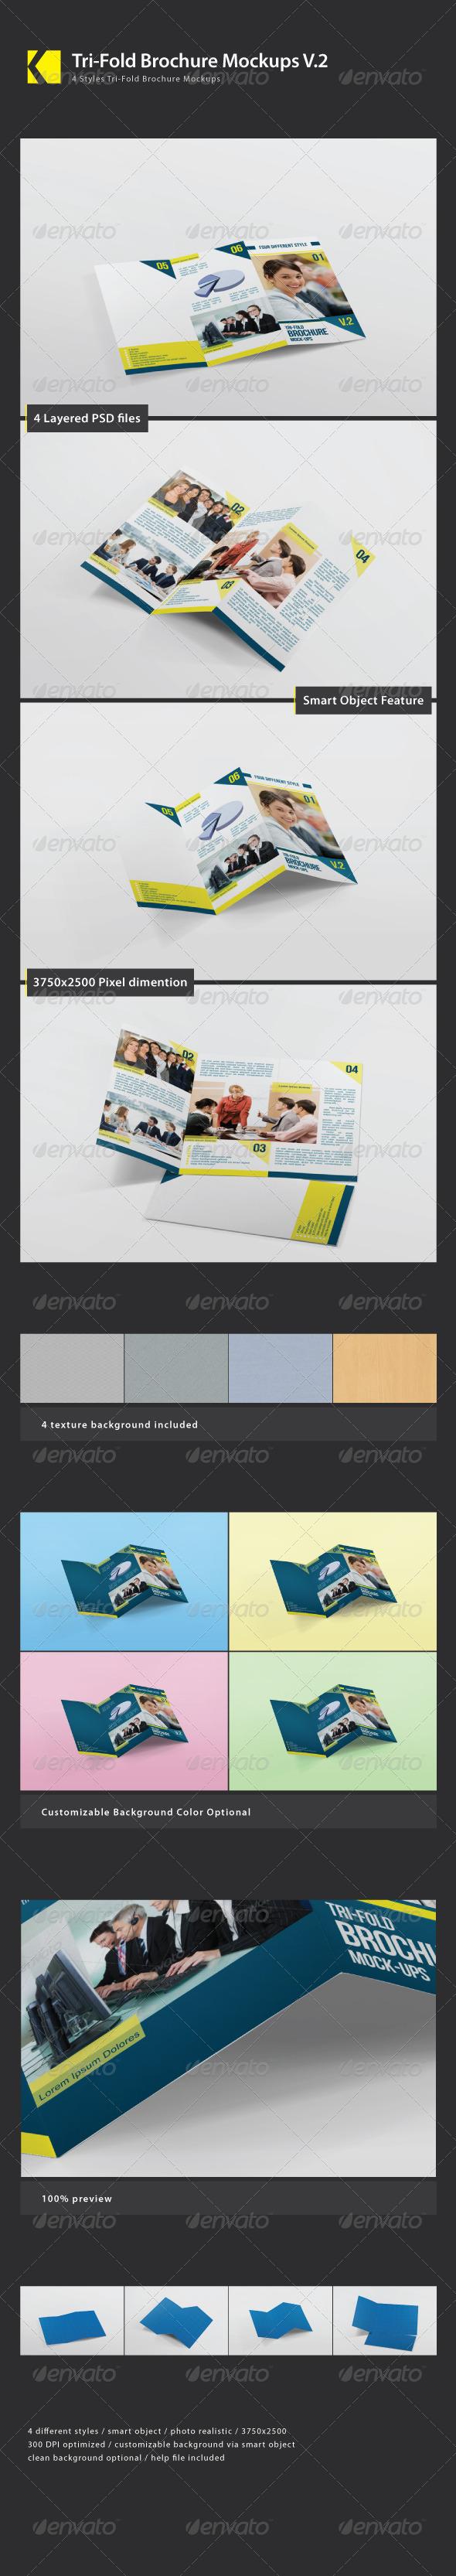 Tri-Fold Brochure Mockups Vol 02 - Product Mock-Ups Graphics